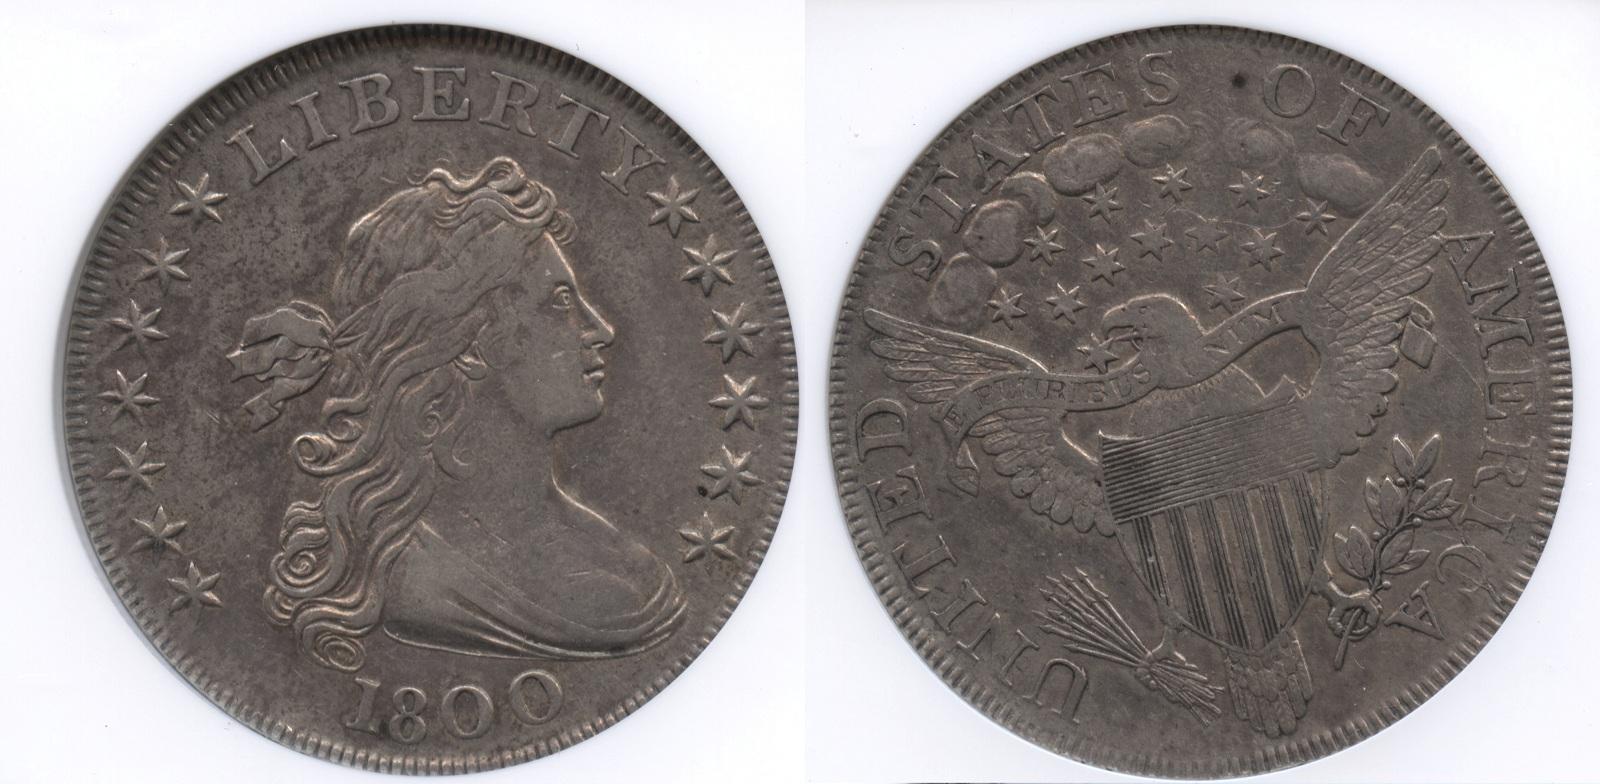 jhS$ 1800 NGC-EF45.jpg